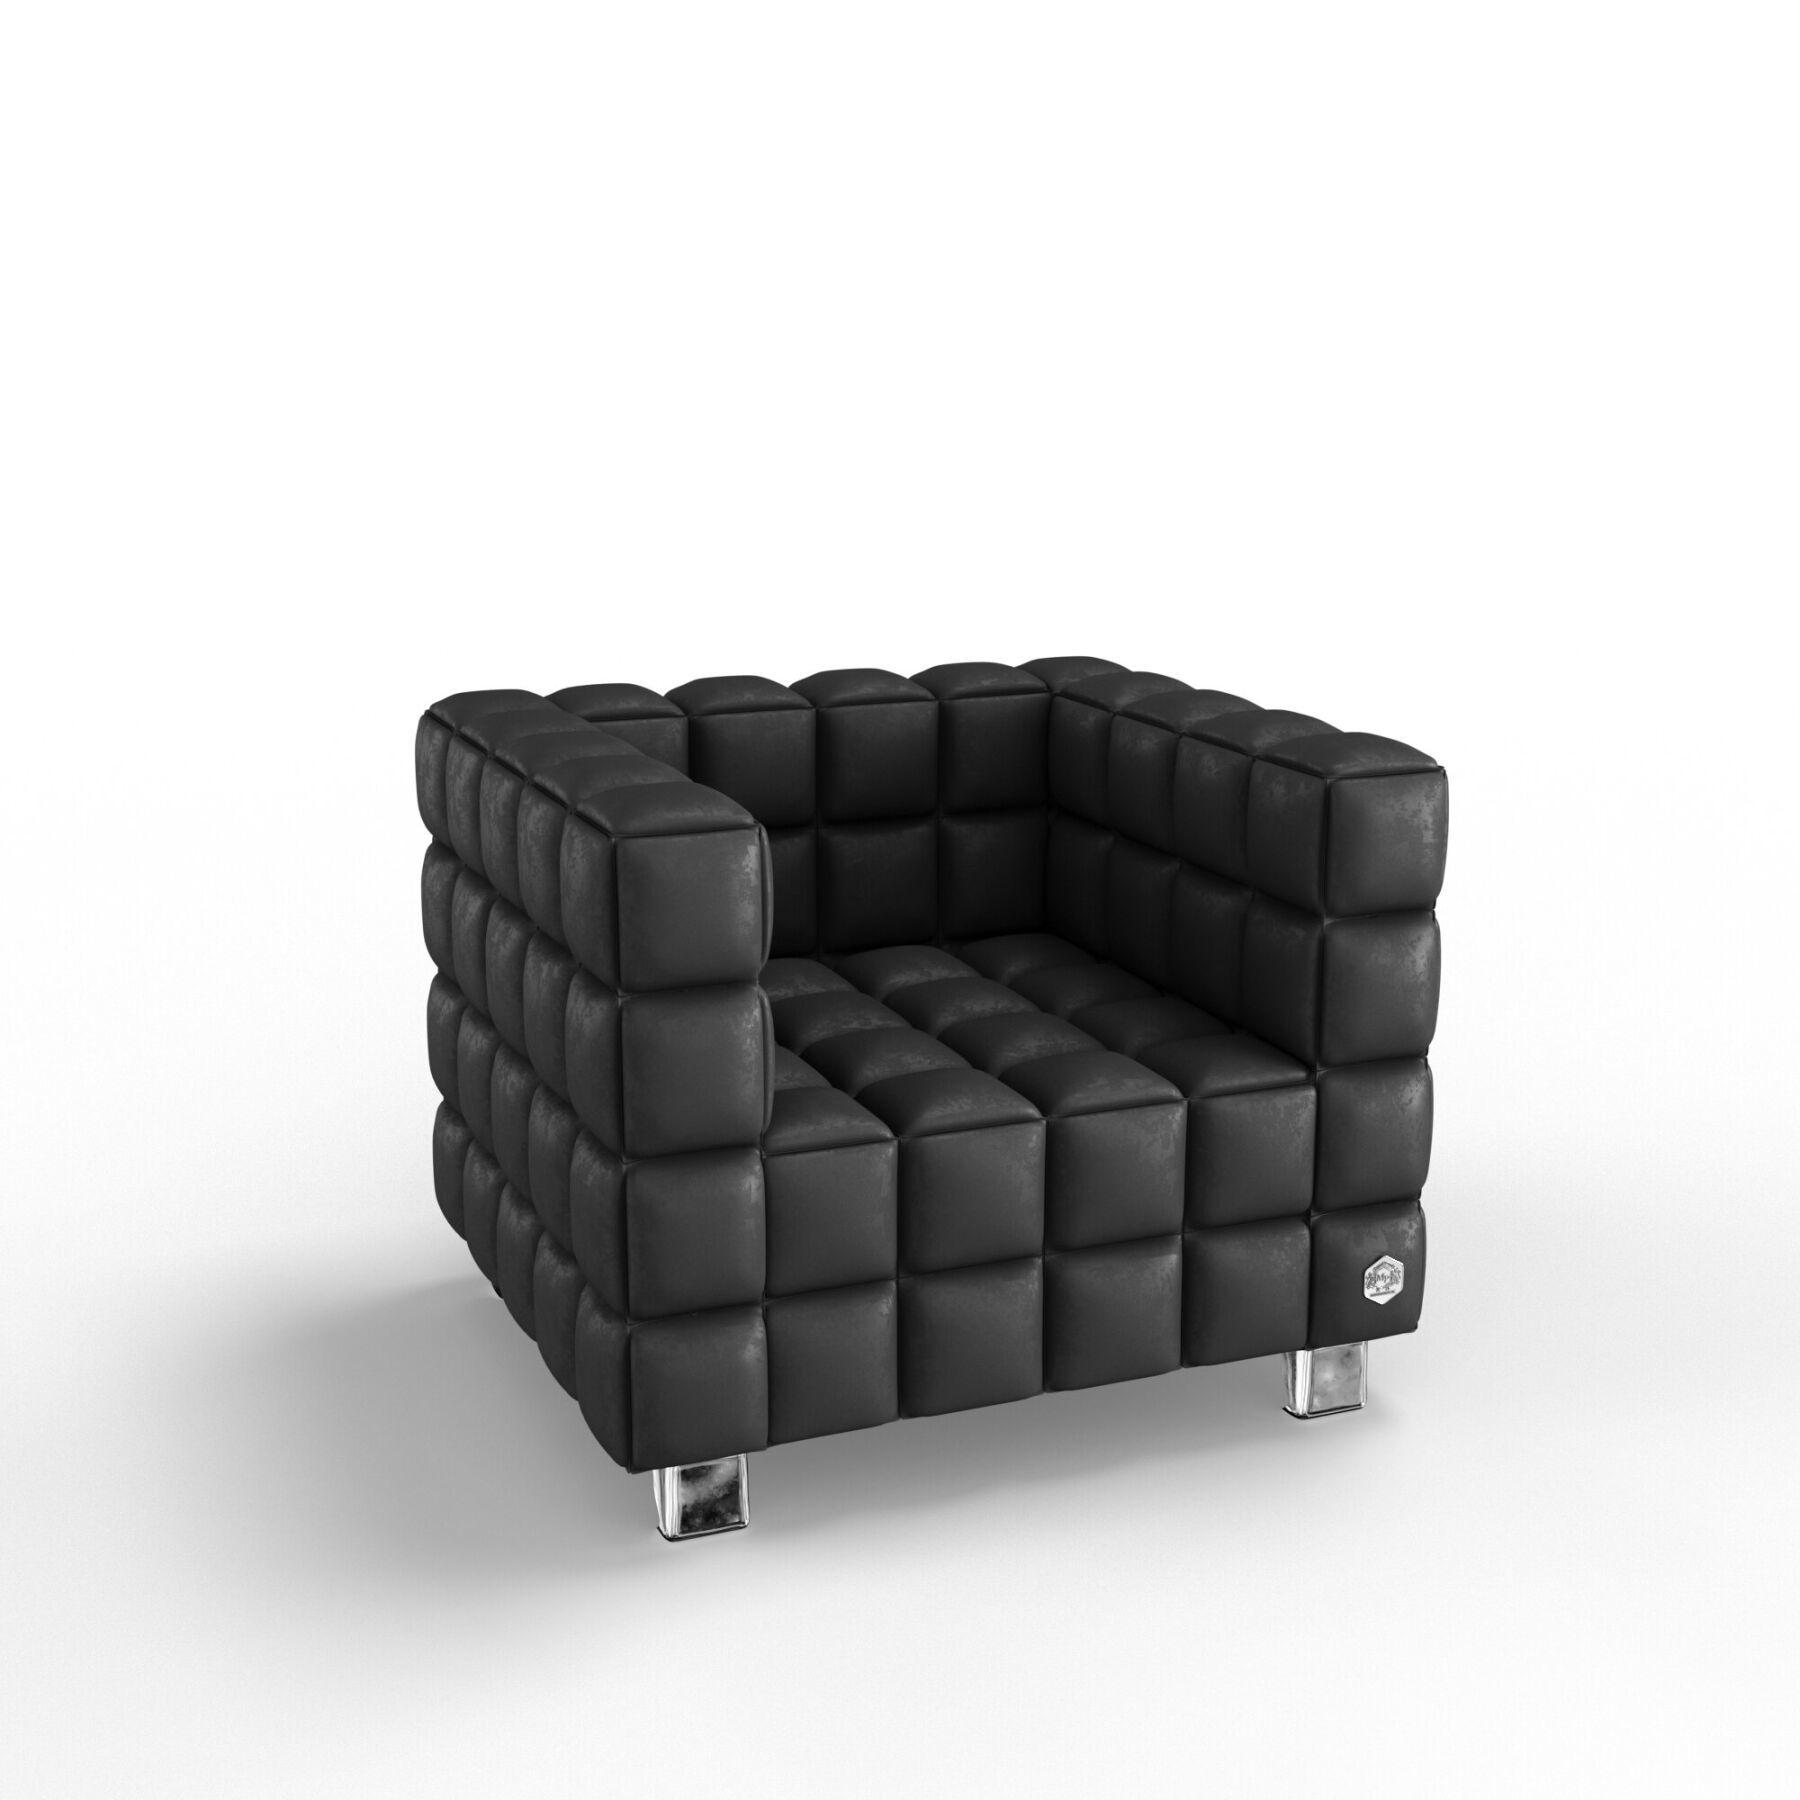 Мягкое кресло KULIK SYSTEM NEXUS Антара 1